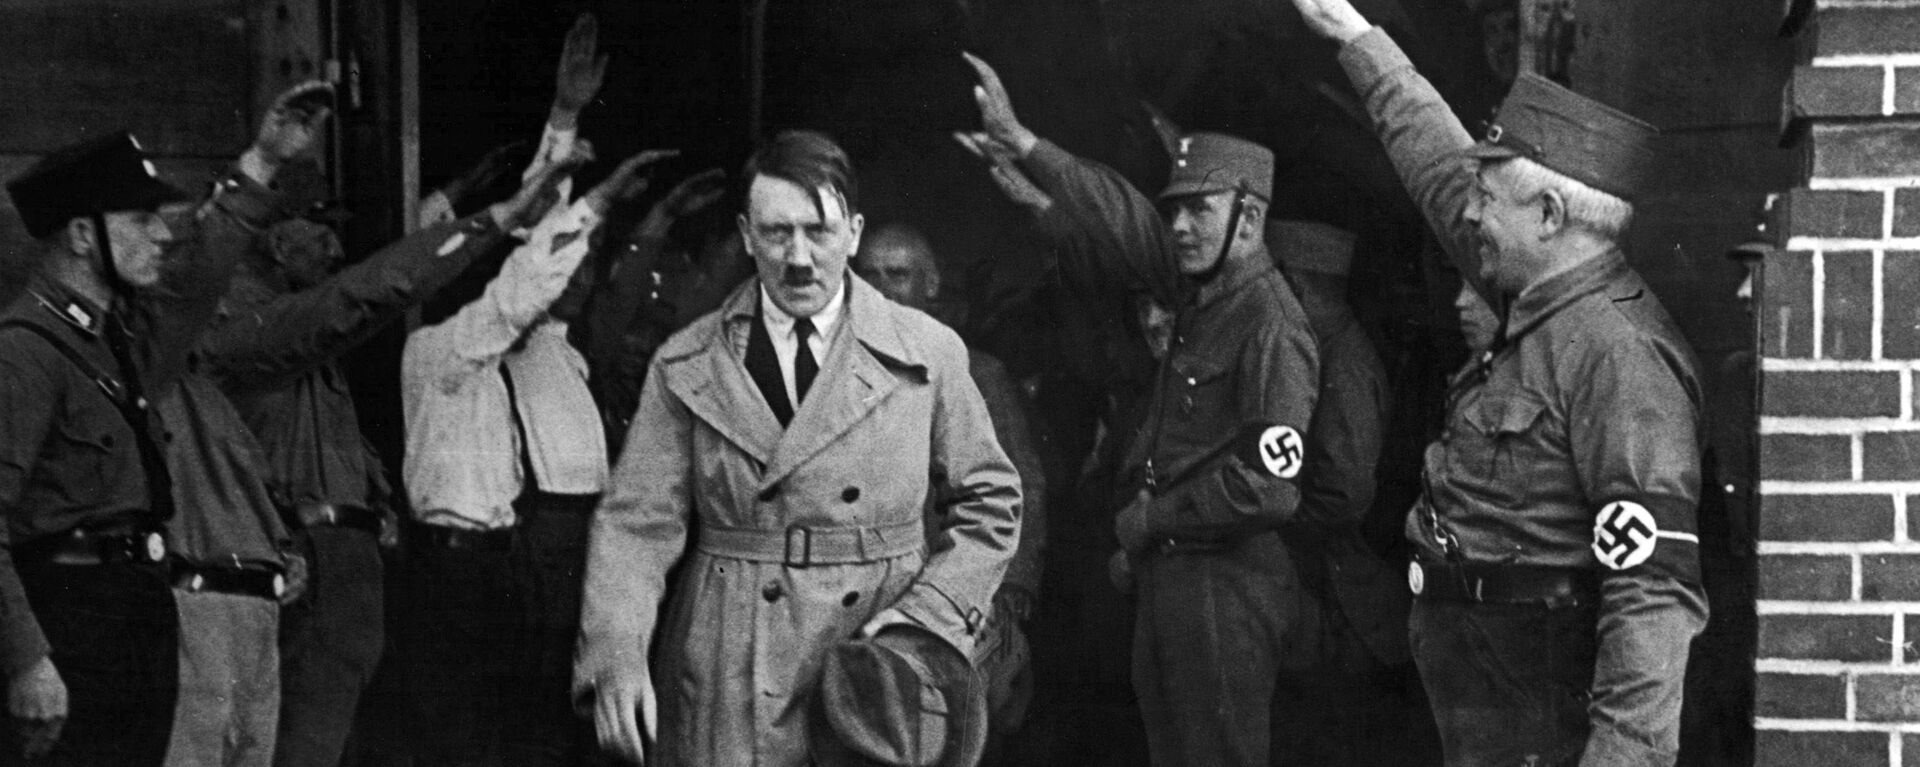 Adolf Hitler, líder de la Alemania nazi (archivo) - Sputnik Mundo, 1920, 17.12.2020